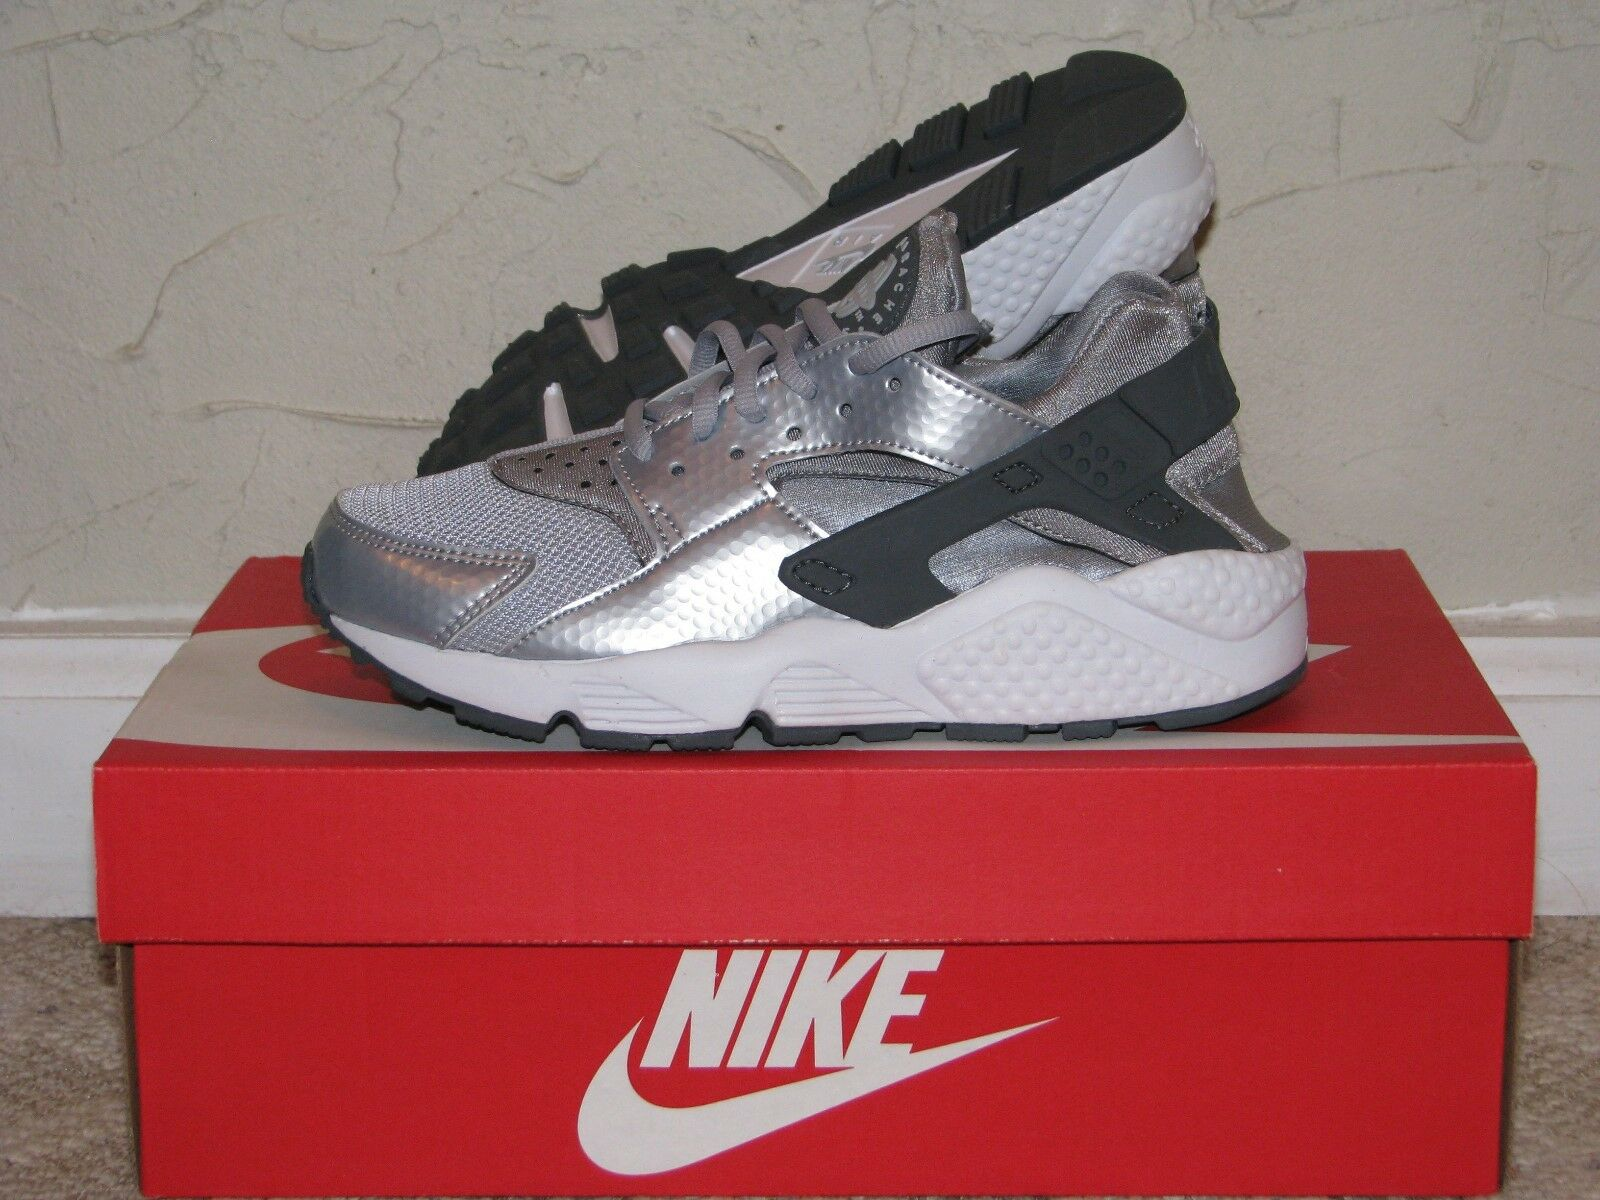 Nike Air Huarache Run Wolf Grey / Dark Grey Womens Comfortable Cheap and beautiful fashion